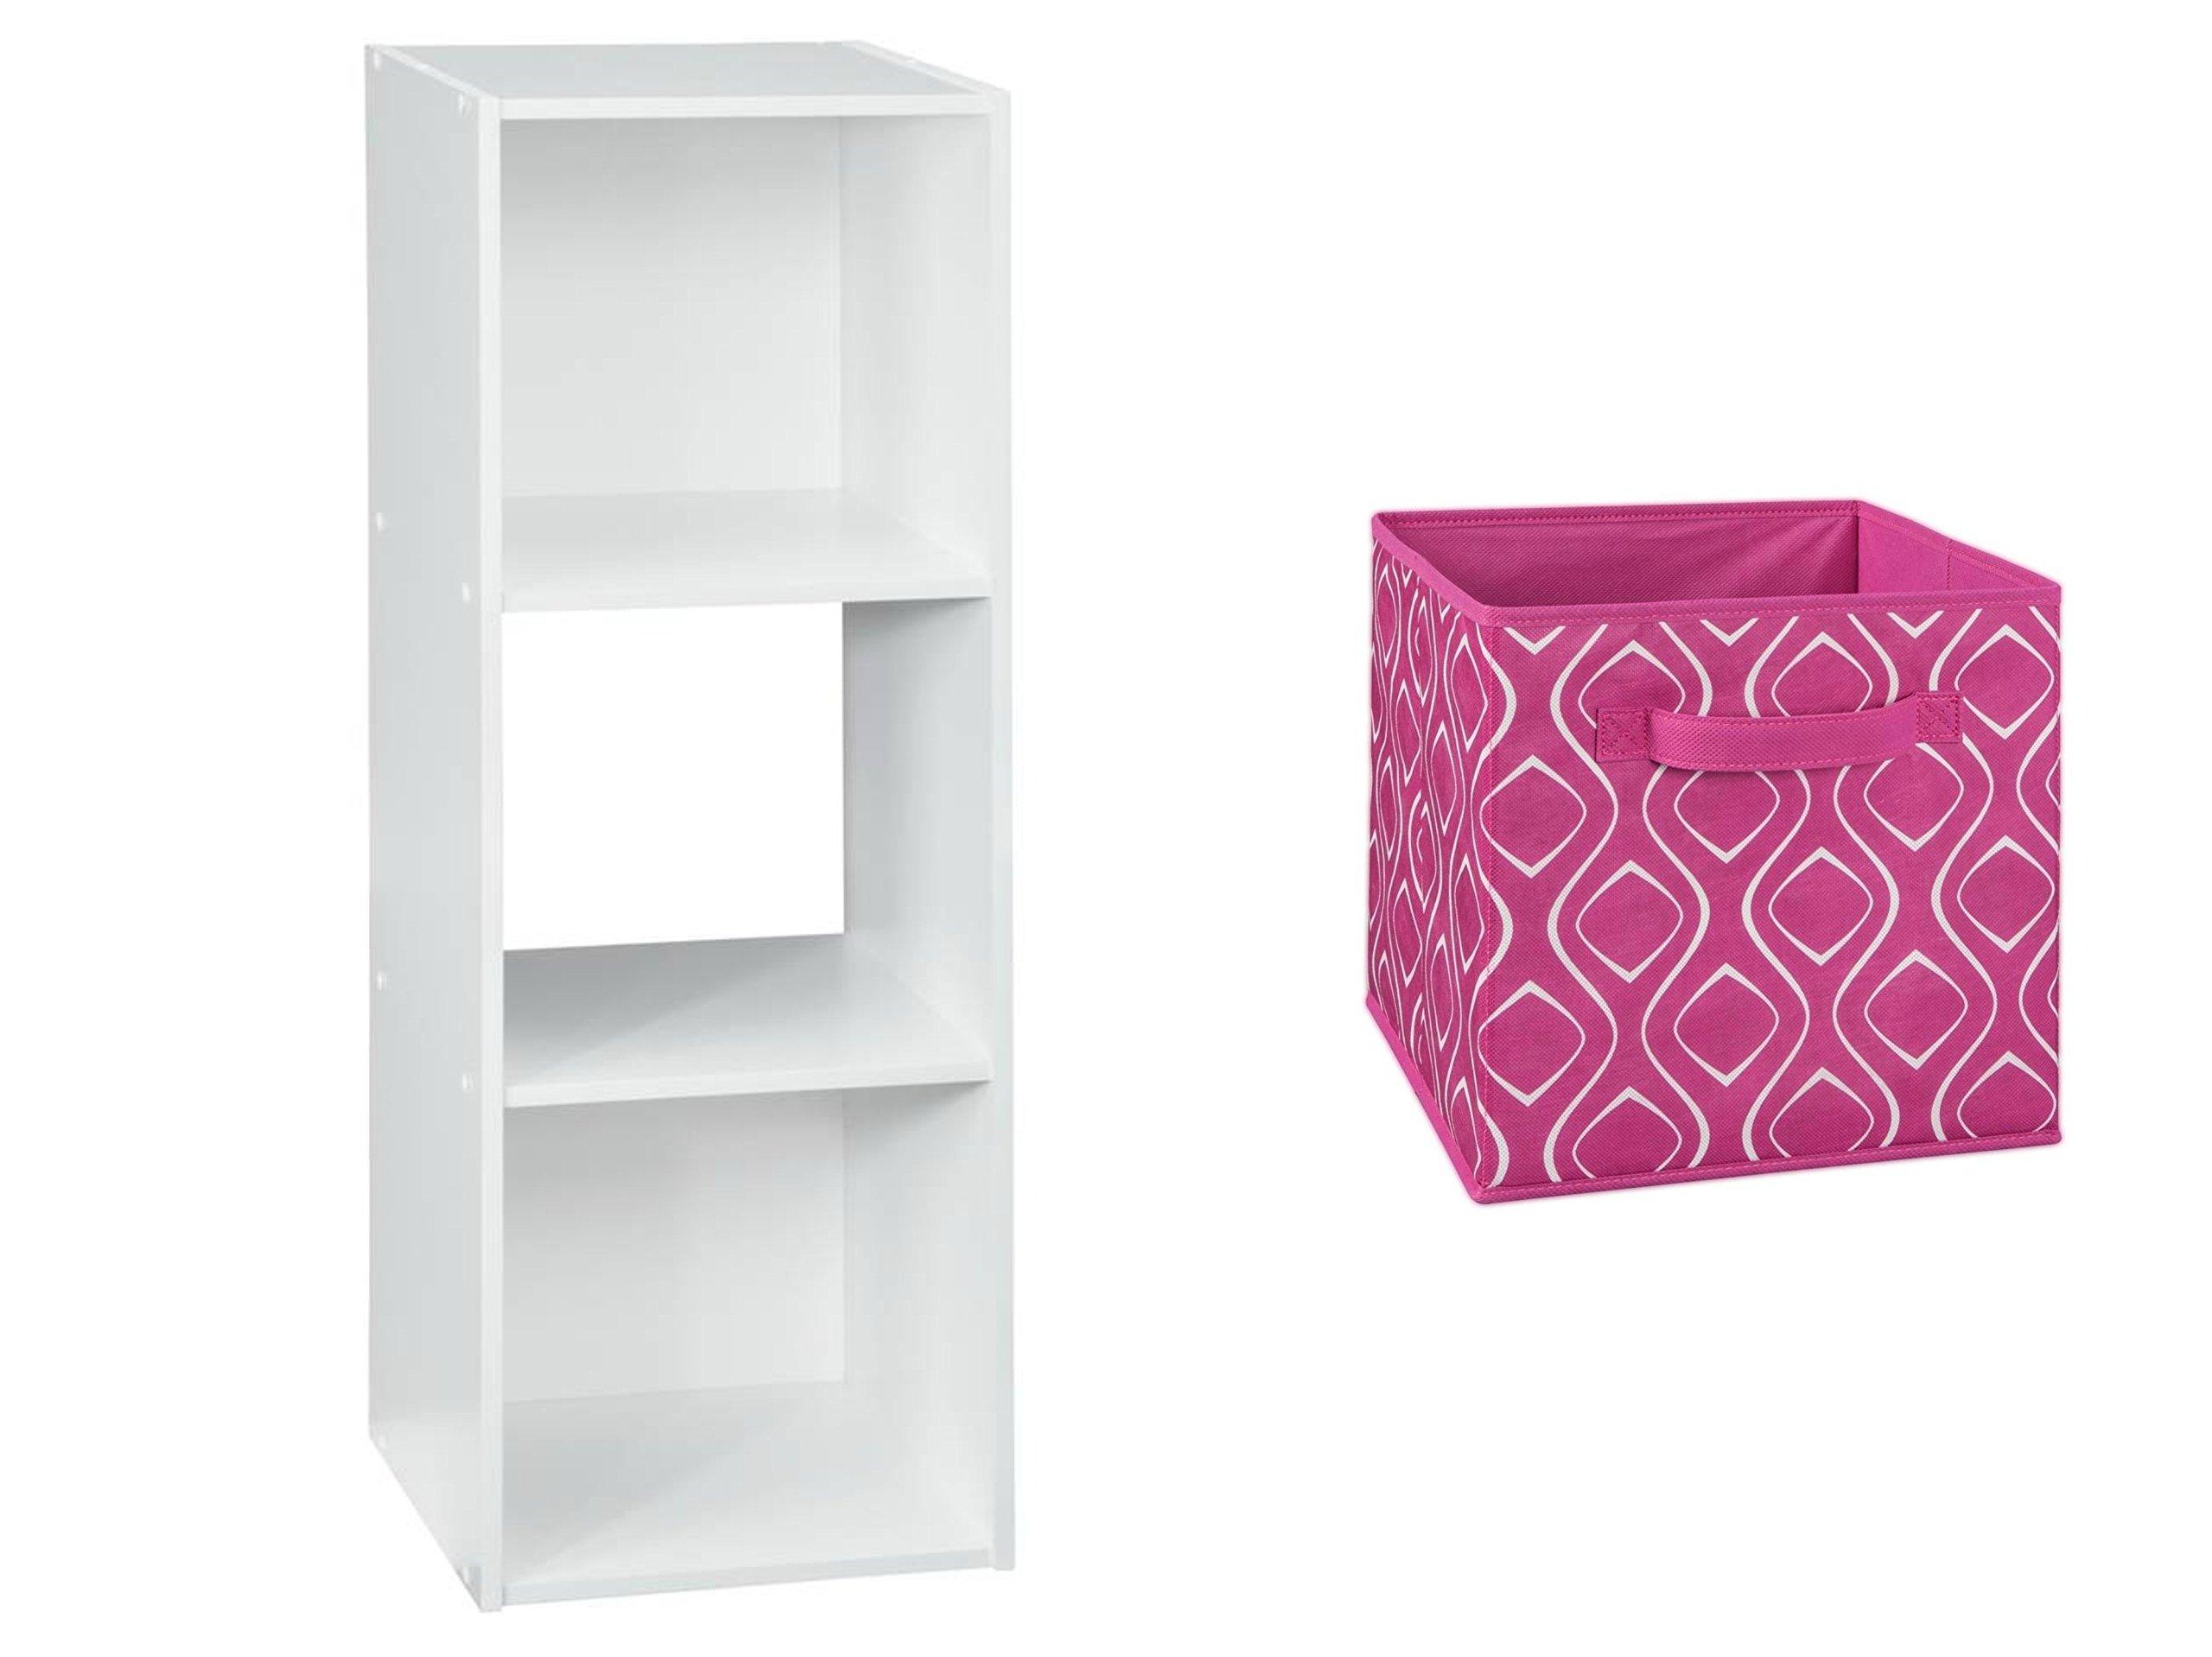 ClosetMaid 3-Cube Organizer in White and ClosetMaid Fabric Drawer in Fuschia